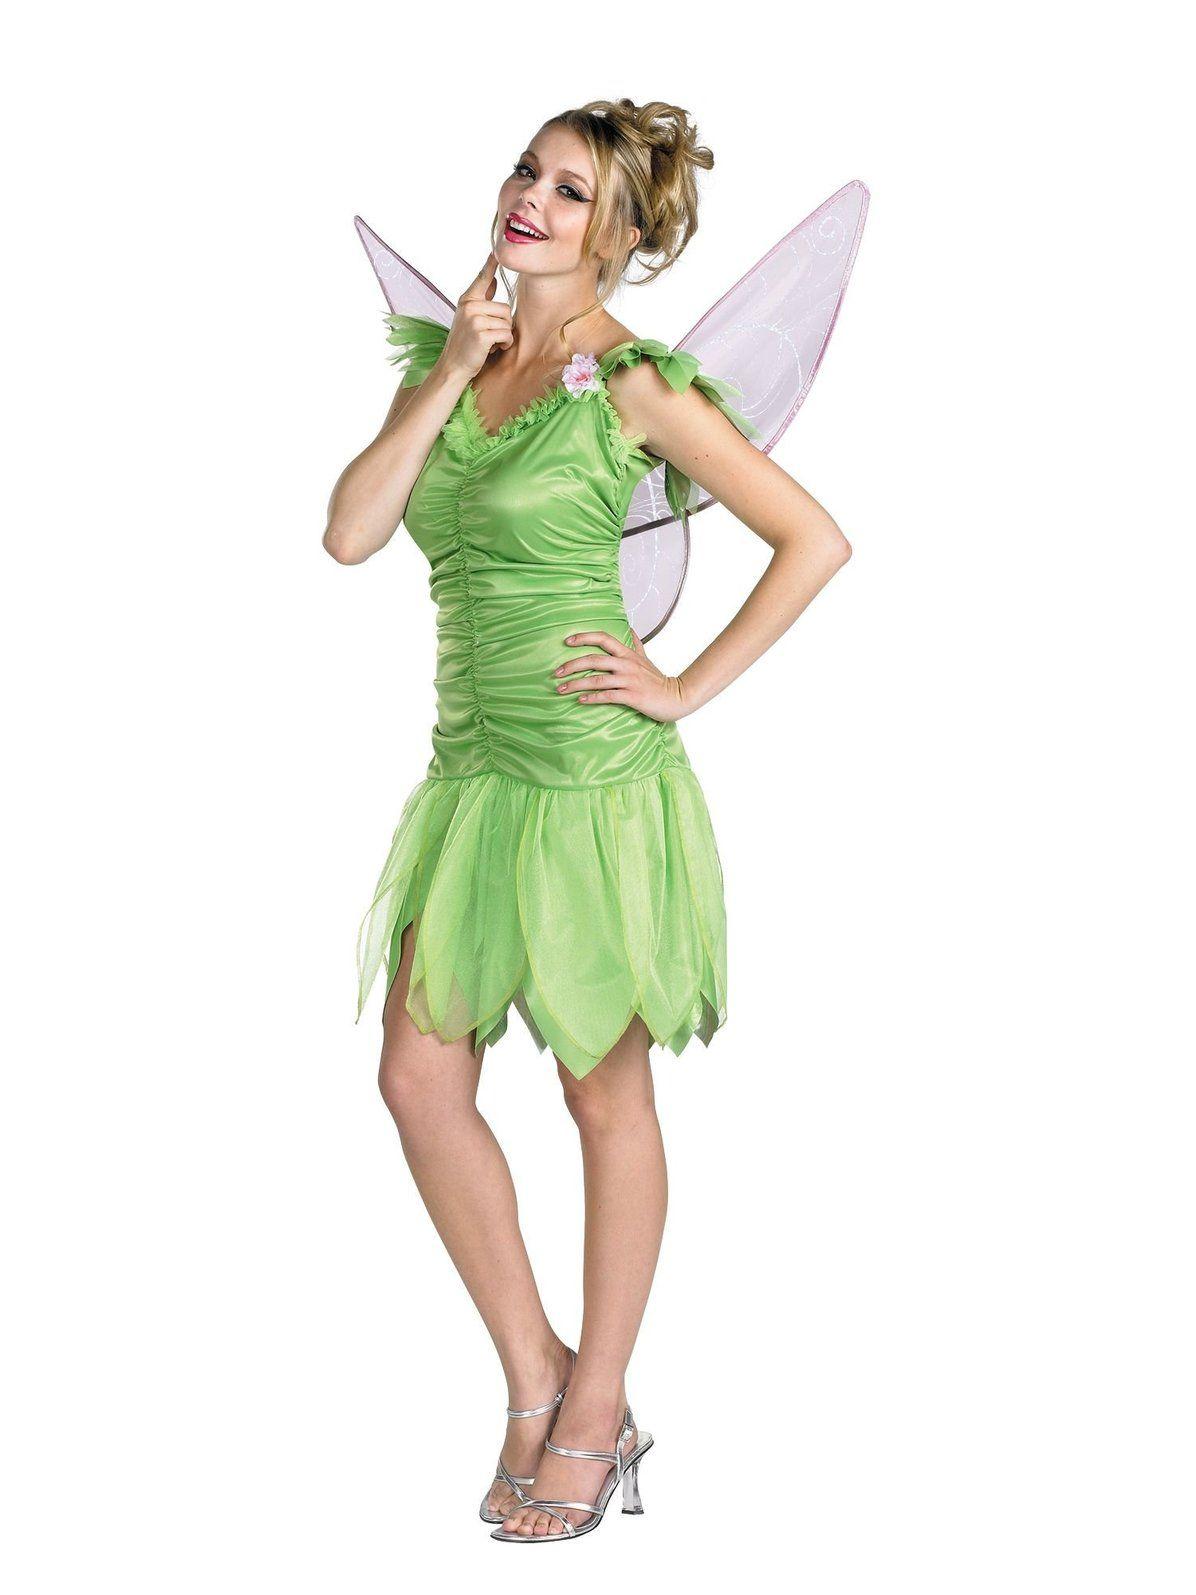 Image for Disney Costume Ideas Female